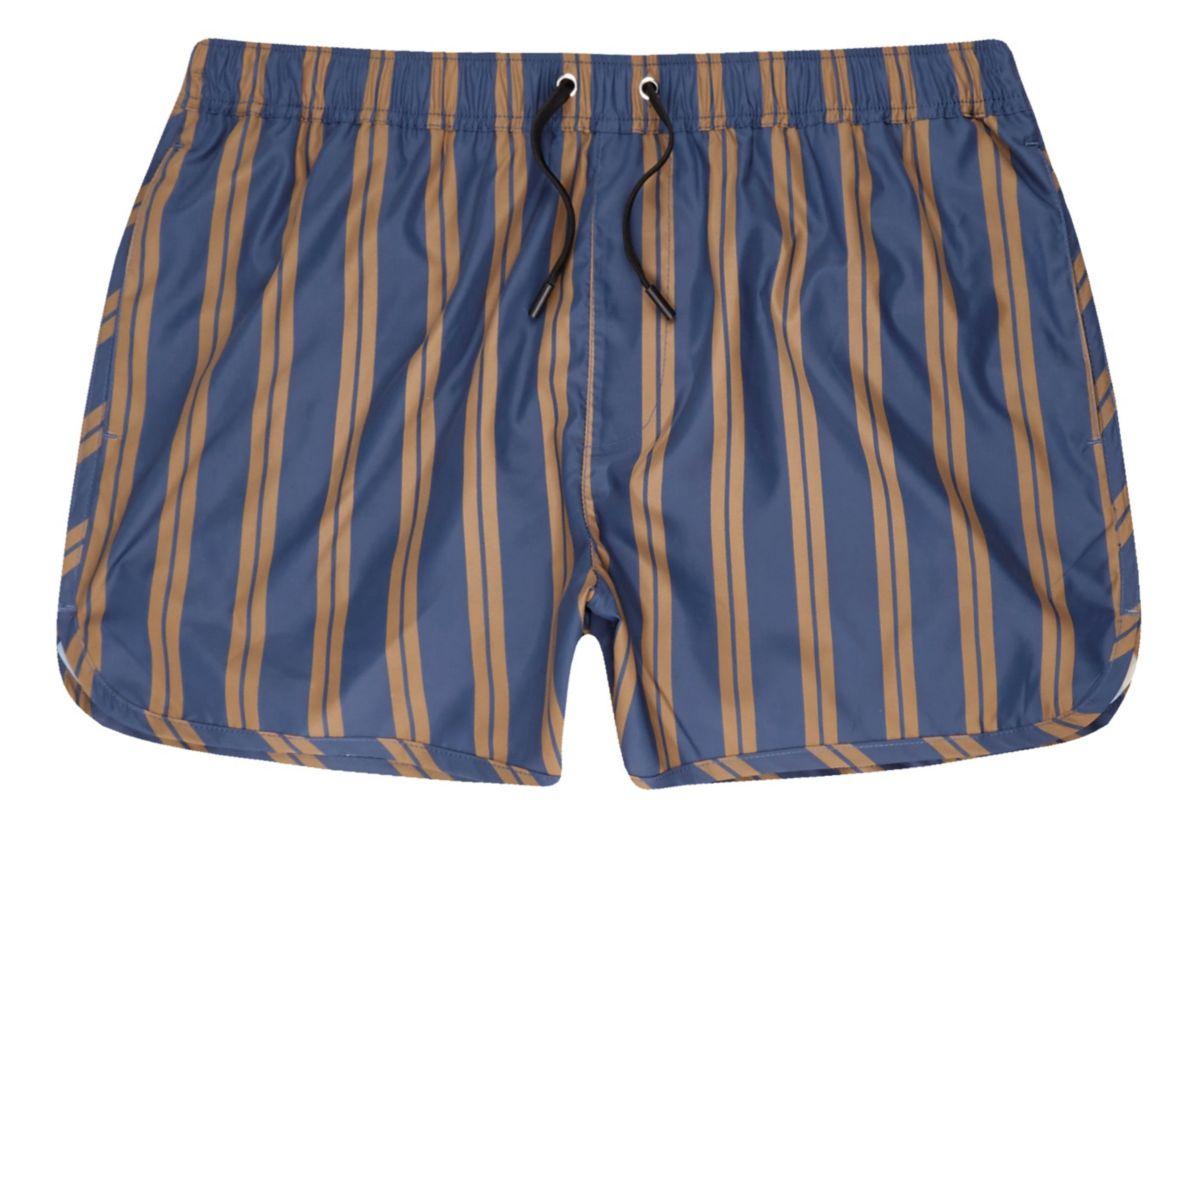 Short de bain rayé bleu et marron clair